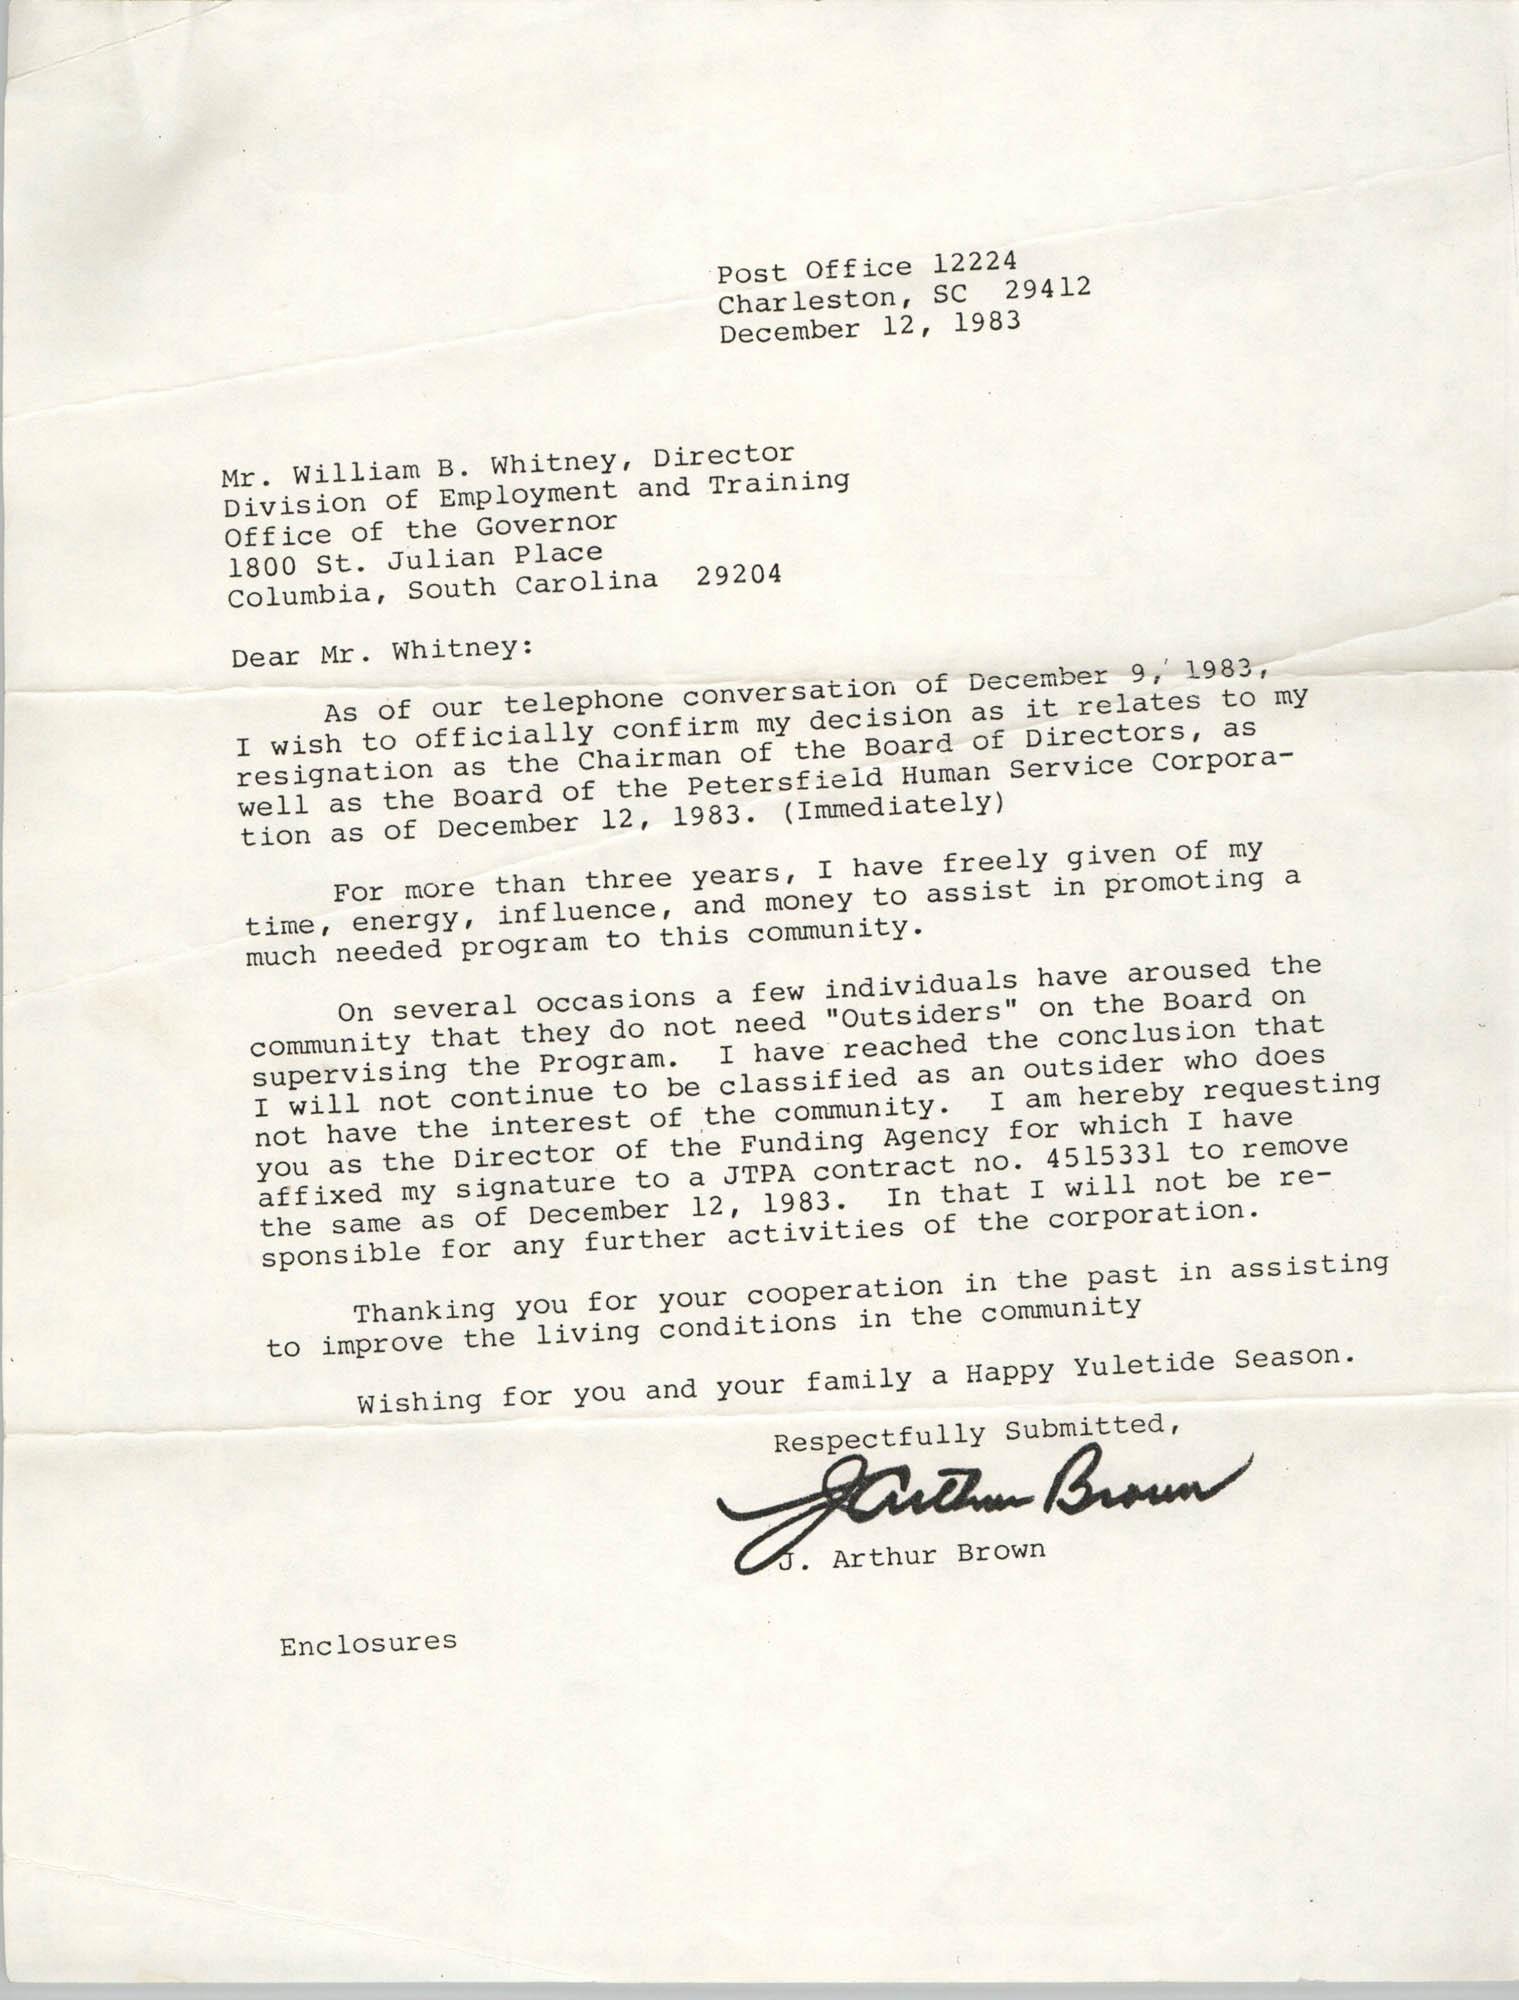 Letter from J. Arthur Brown to William B. Whitney, December 12, 1983